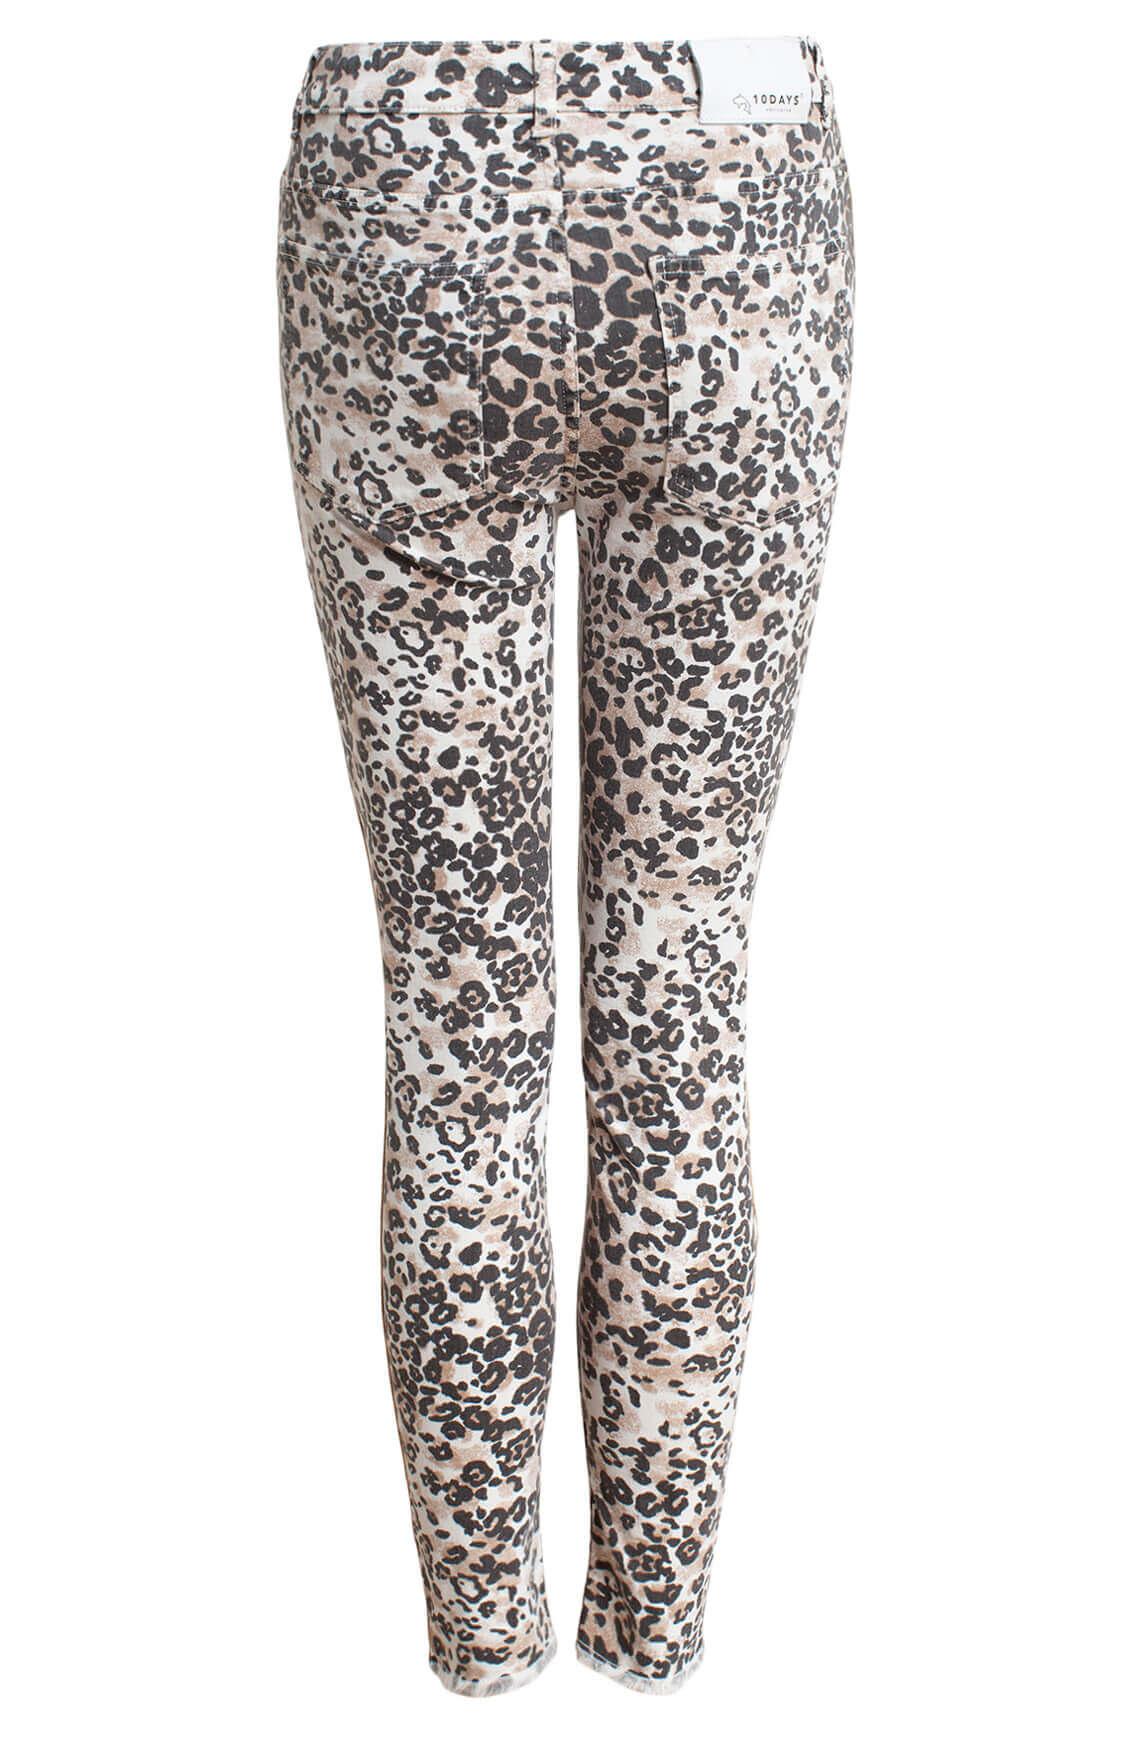 10 Days Dames Leopard jeans Bruin